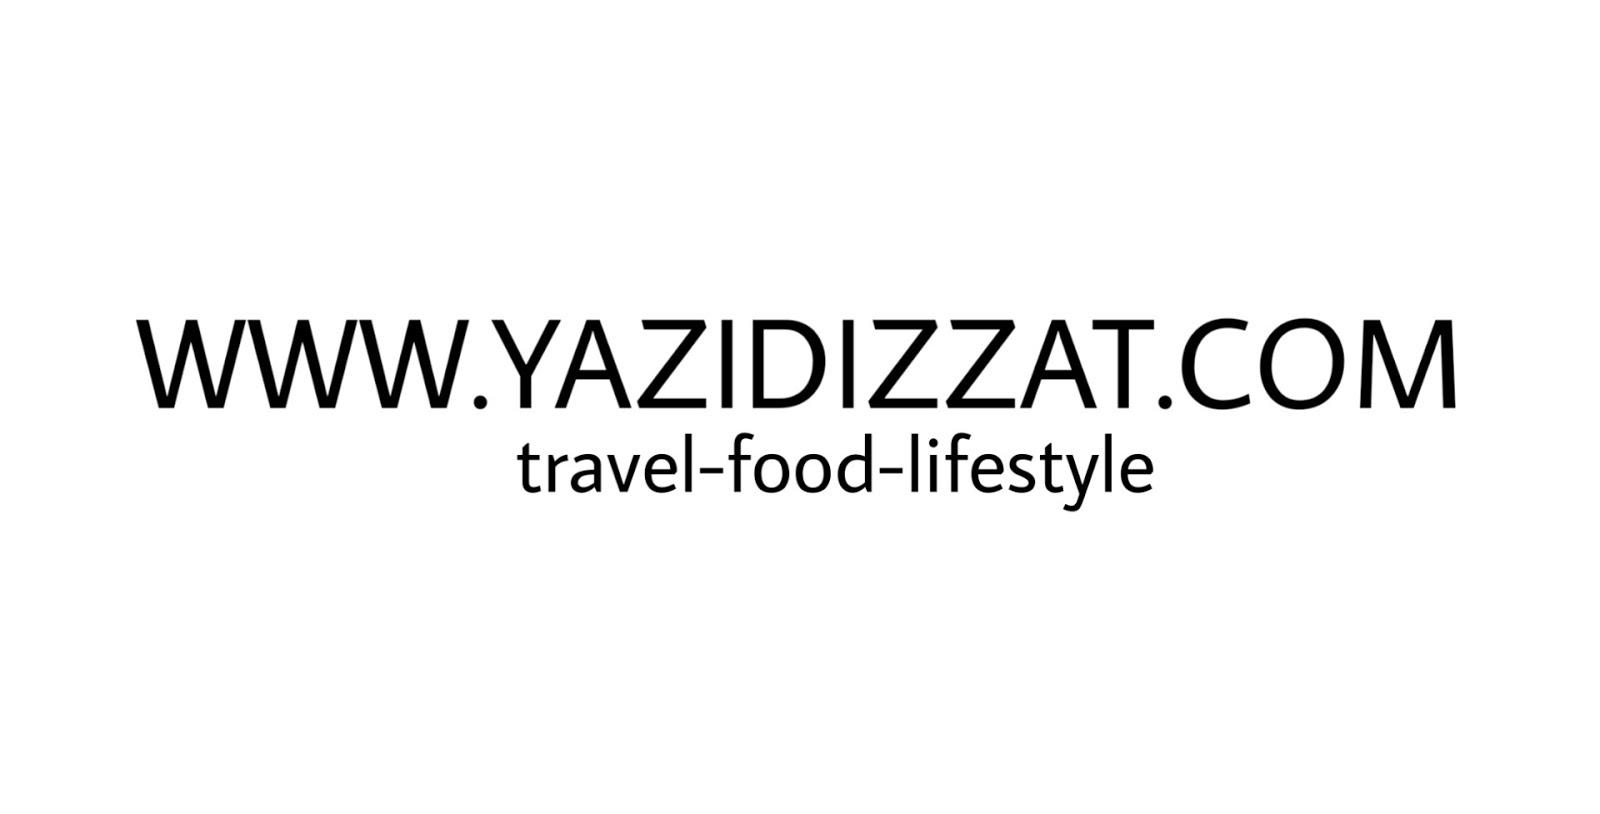 Yazid Izzat